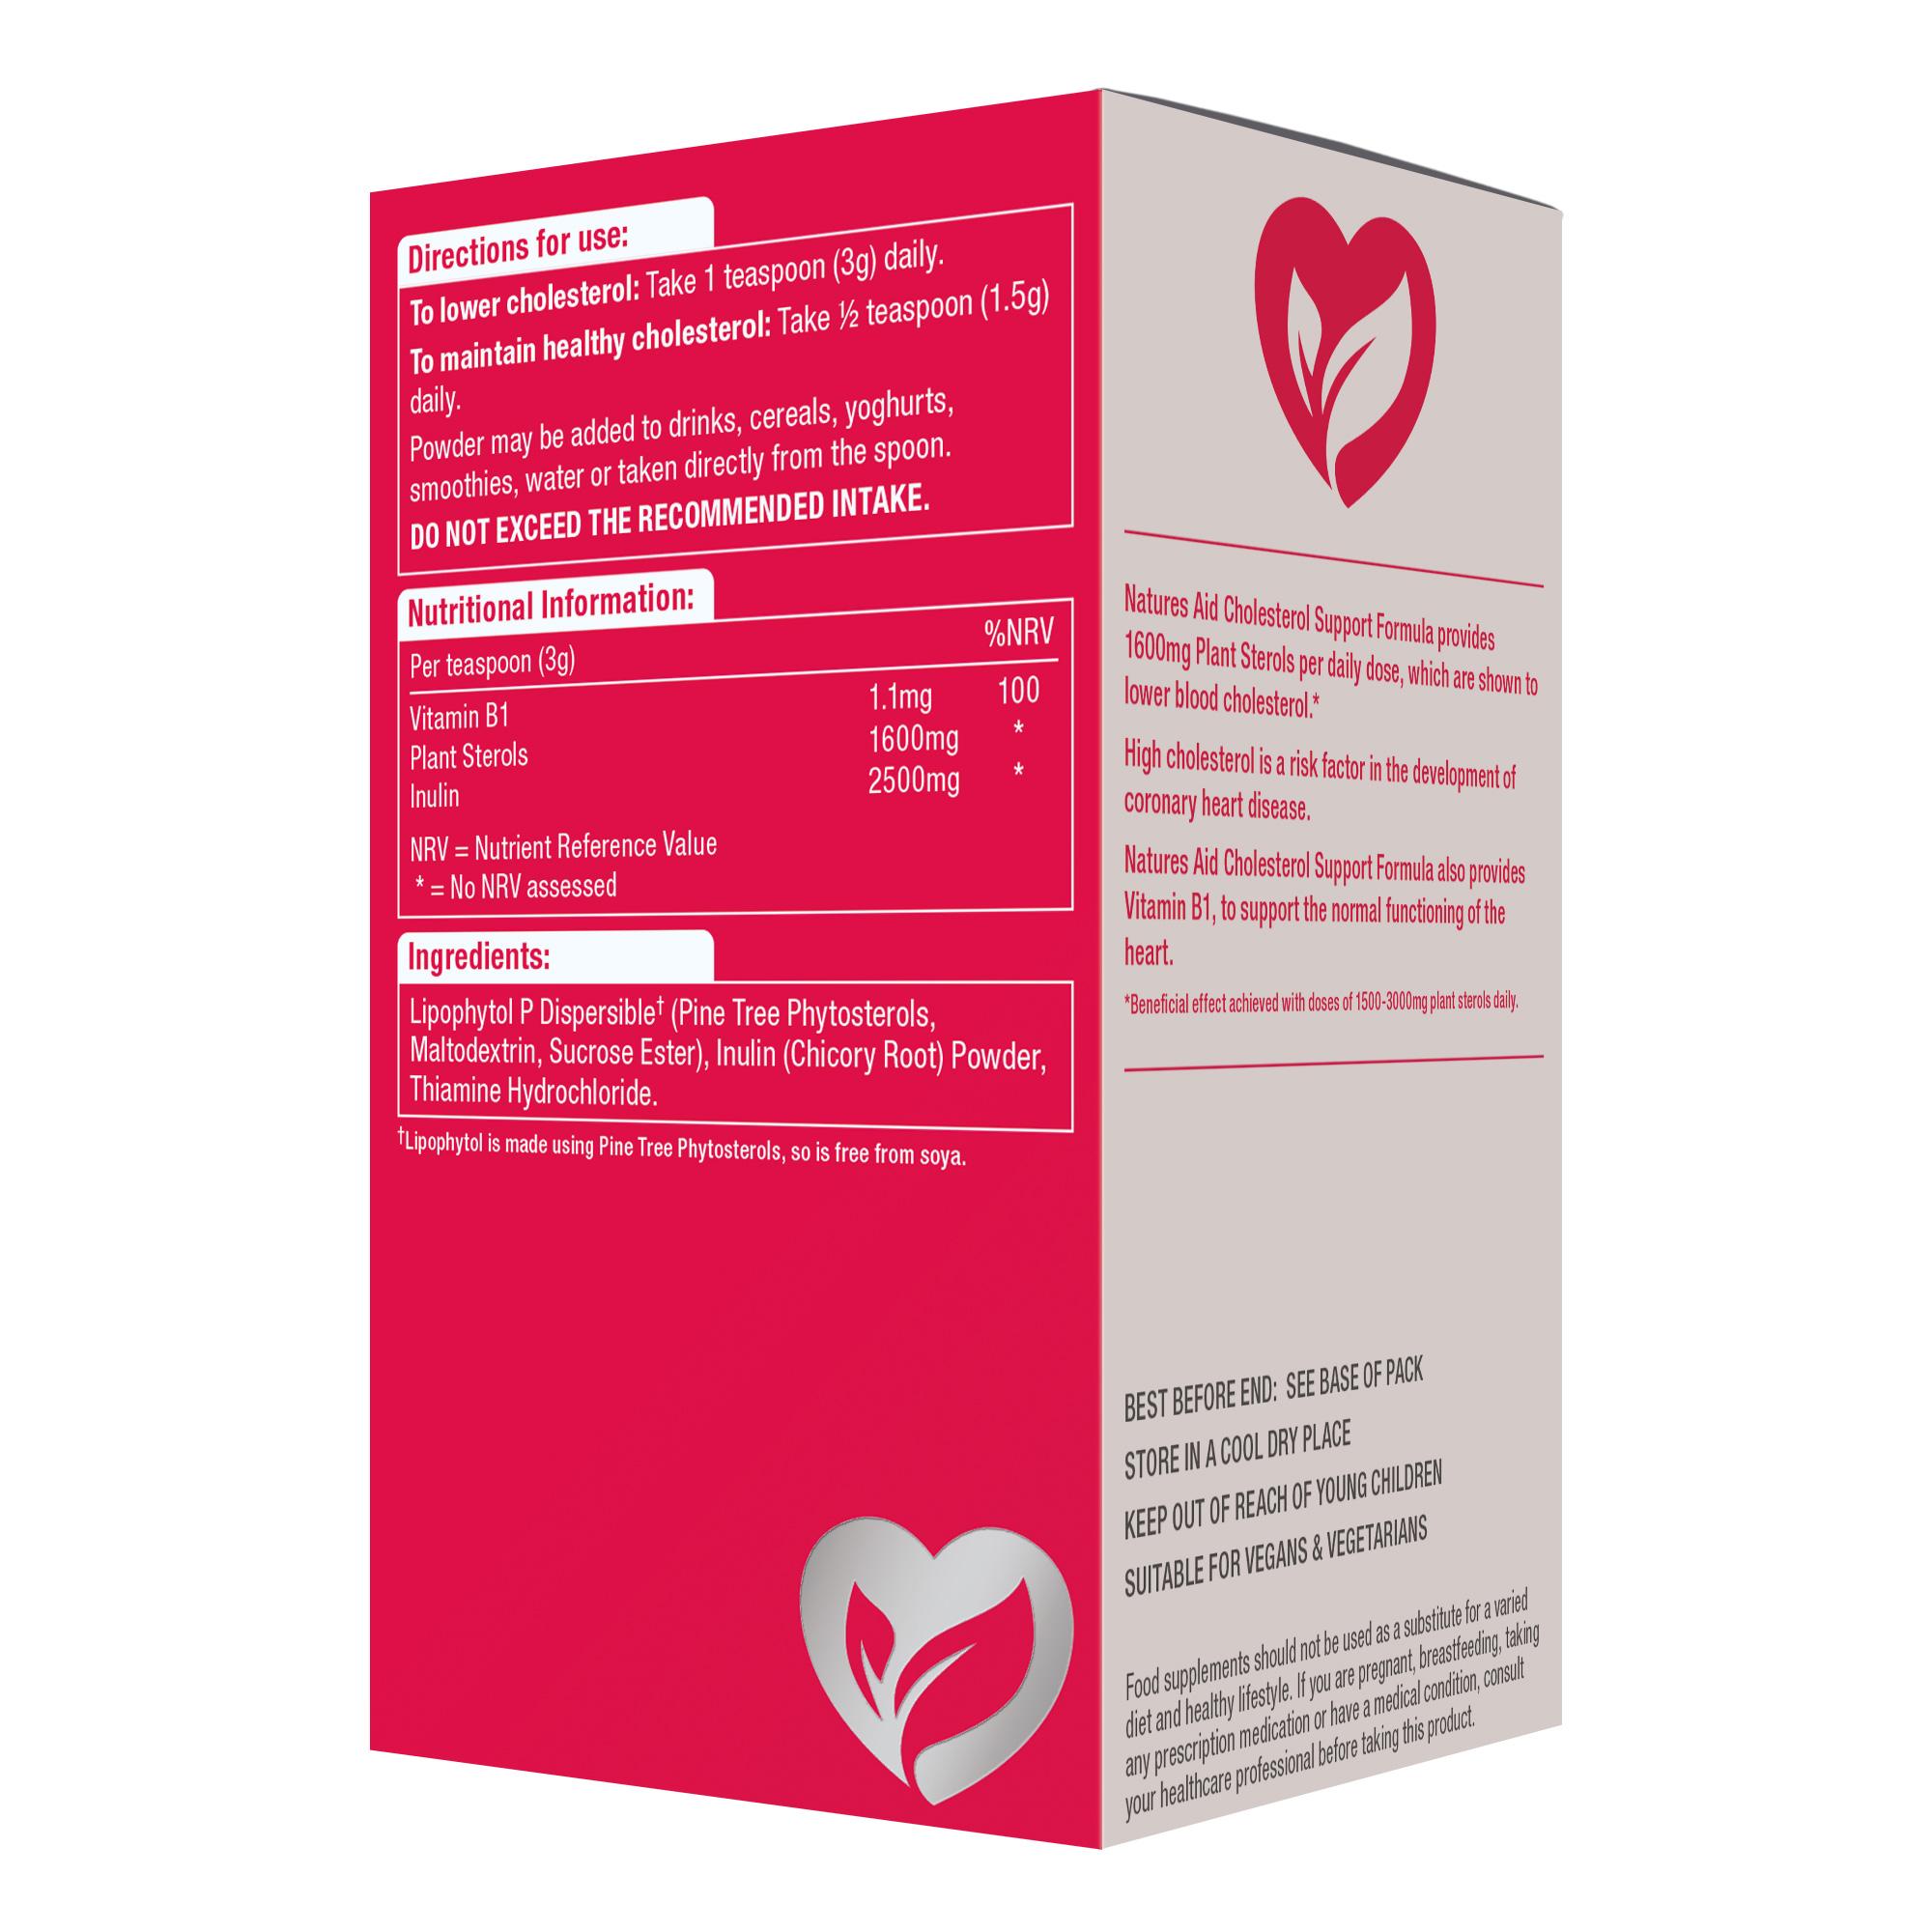 Cholesterol Support Formula 90g